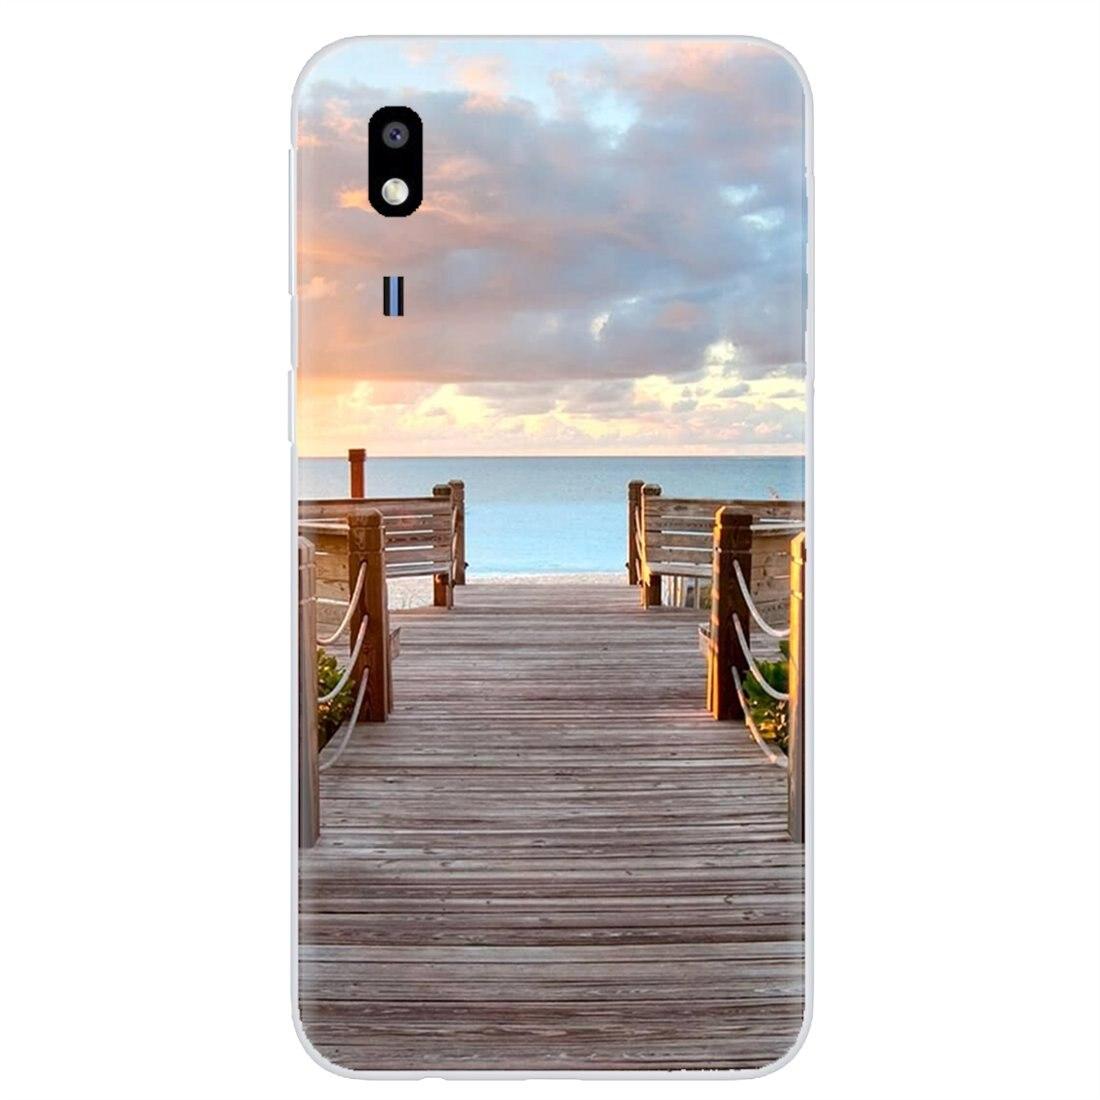 For Xiaomi Redmi 4A 7A S2 Note 8 3 3S 4 4X 5 Plus 6 7 6A Pro Pocophone F1 Summer Beach Hawaii Aloha Sea Ocean Soft Silicone Case